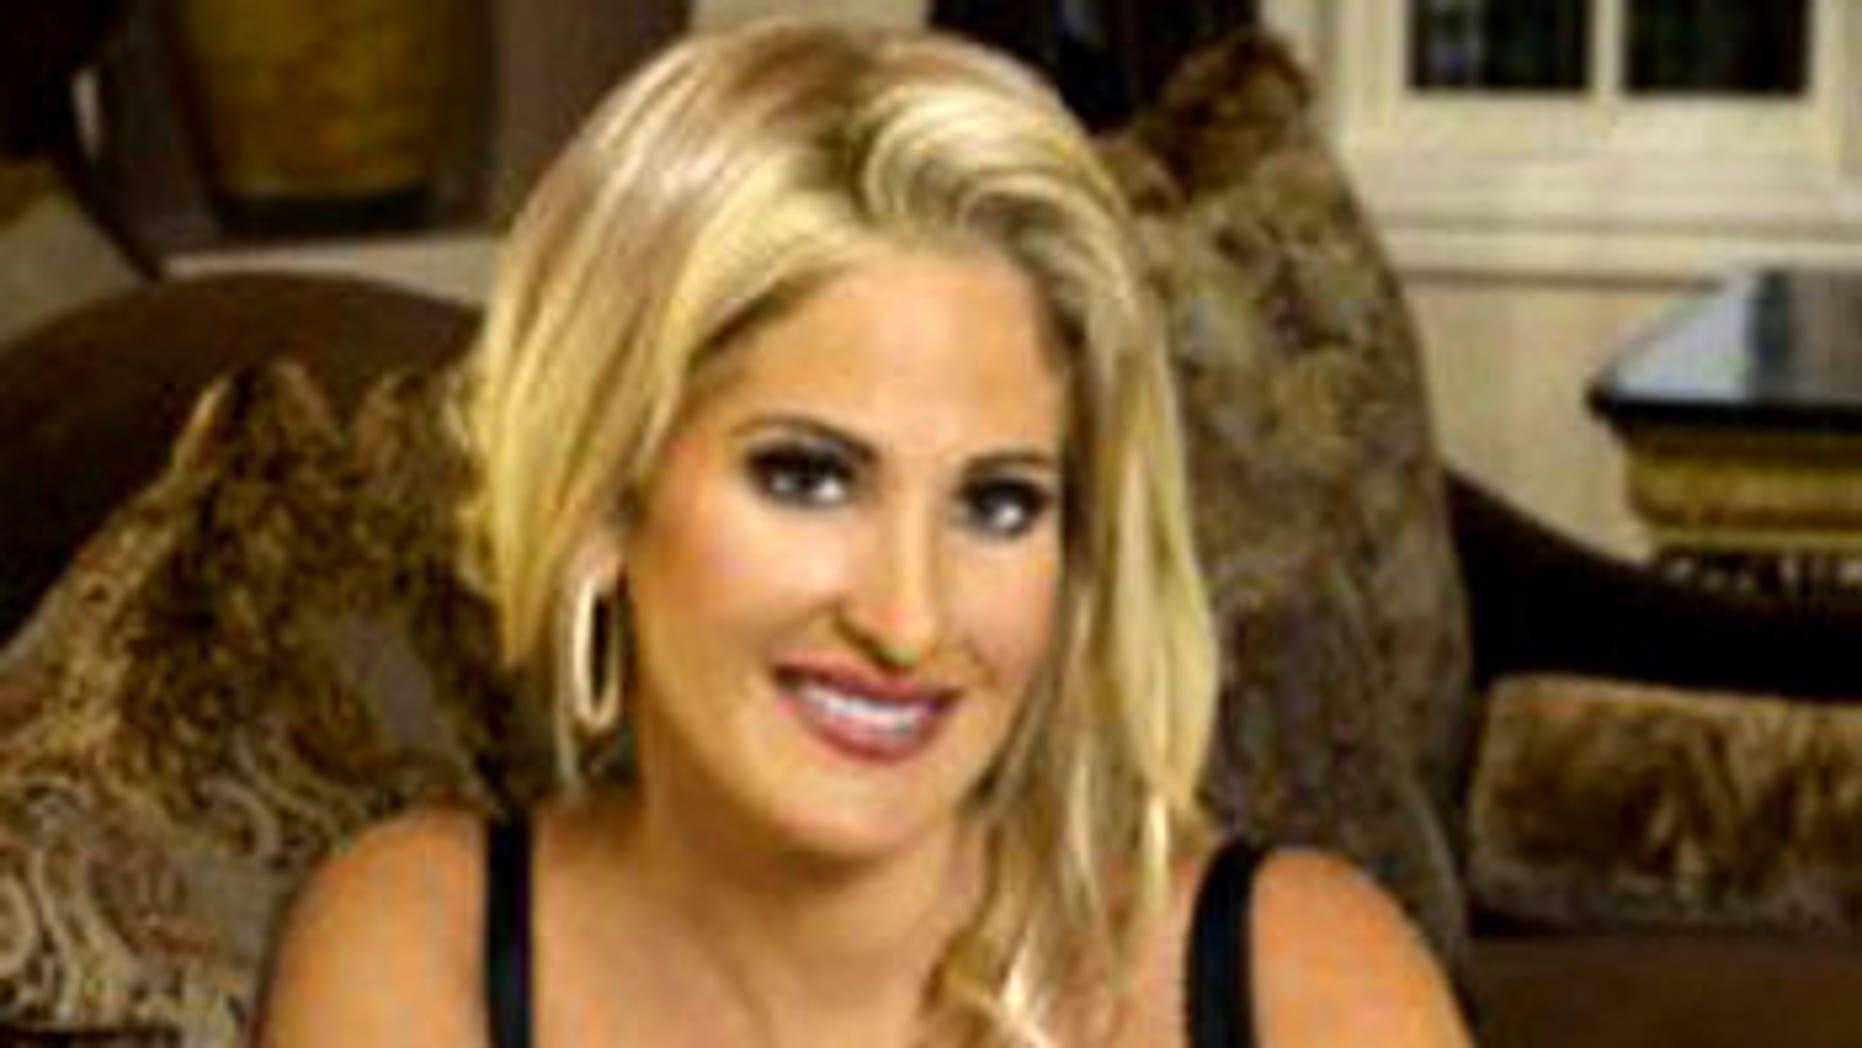 "Kim Zolciak wnet byt the name ""Barbi"" in the early 2000s, an insider tells Pop Tarts."